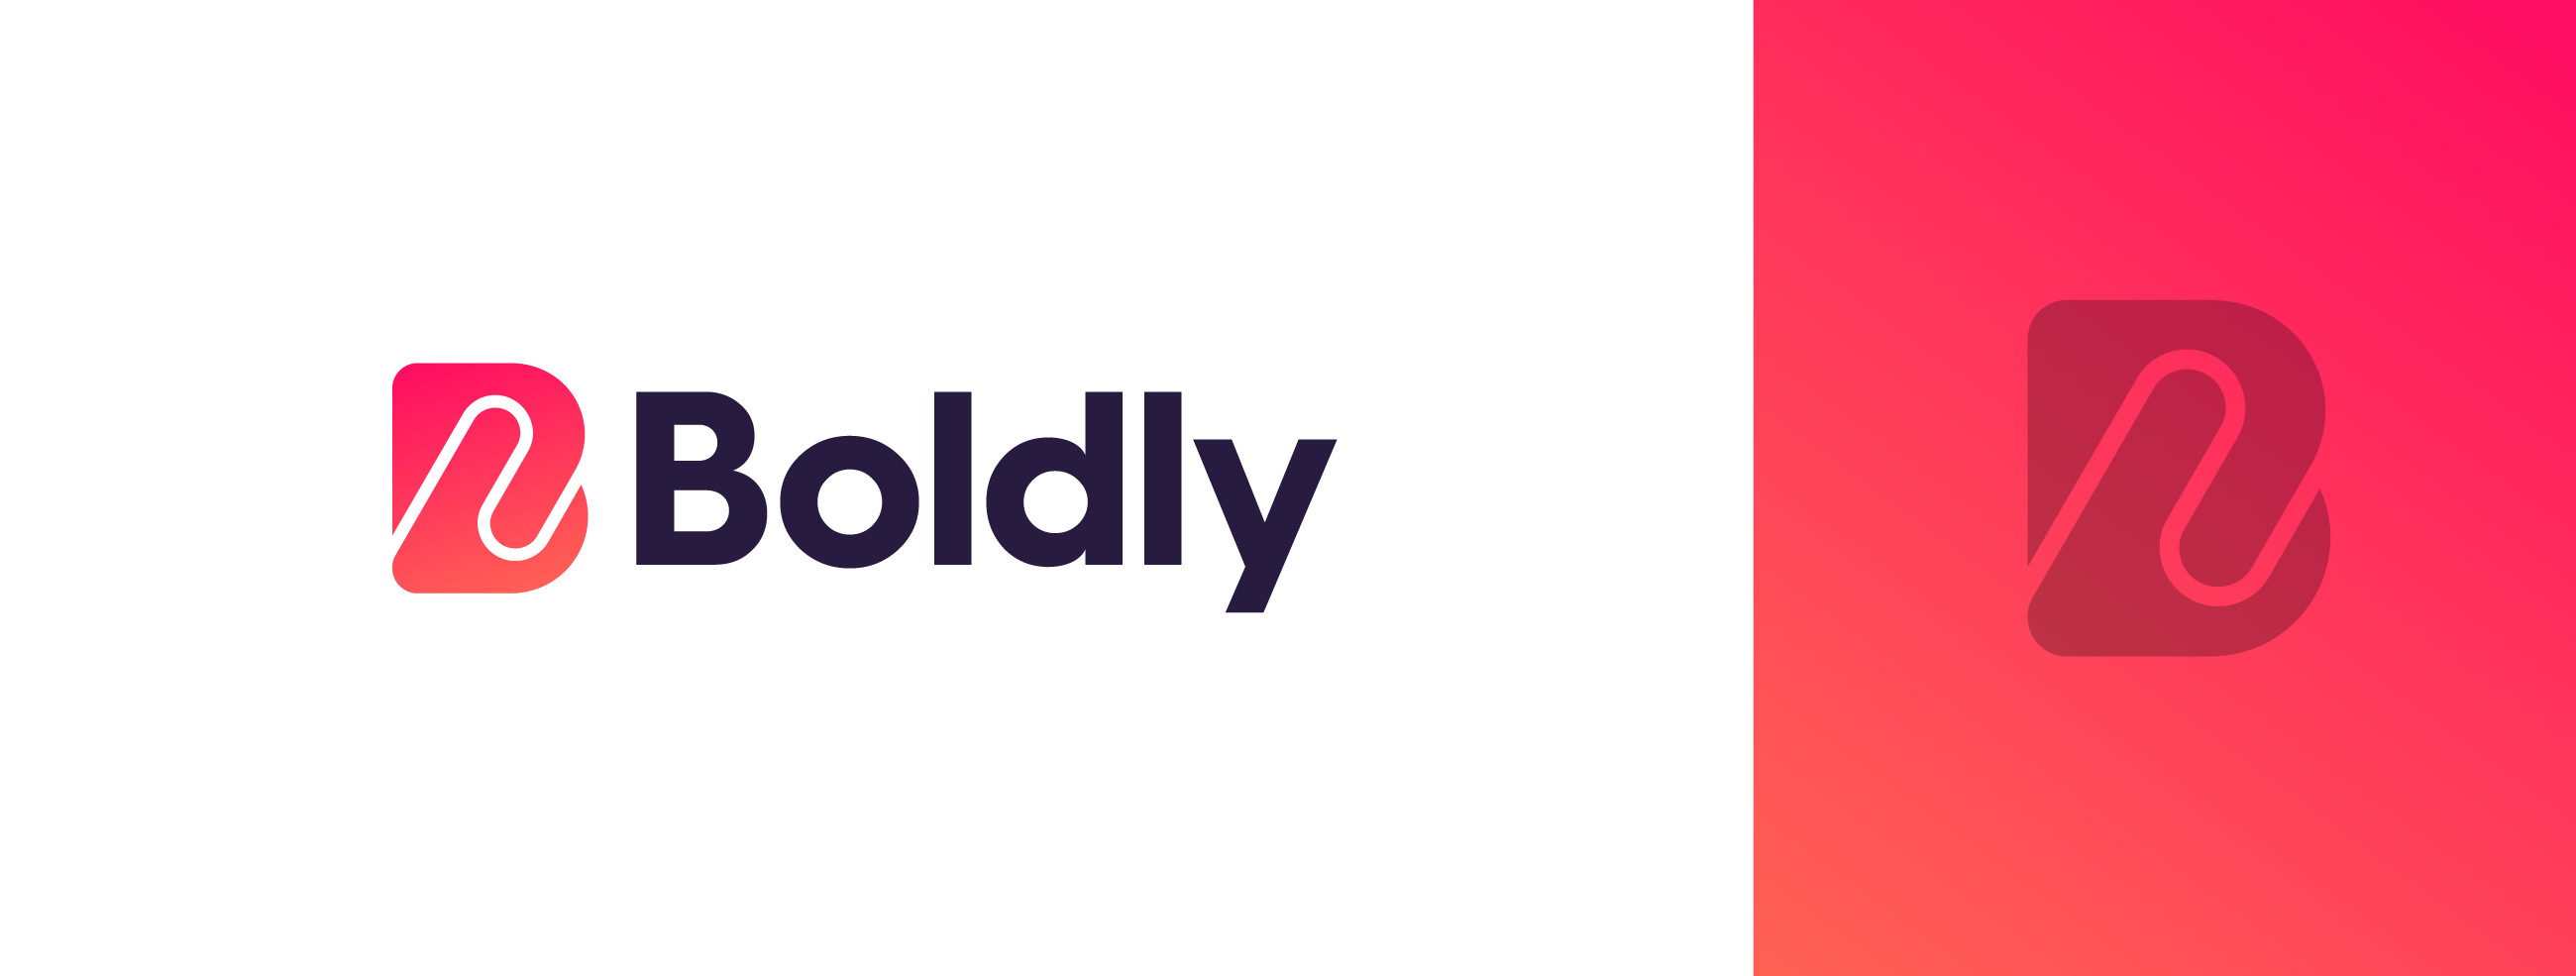 Boldly-final